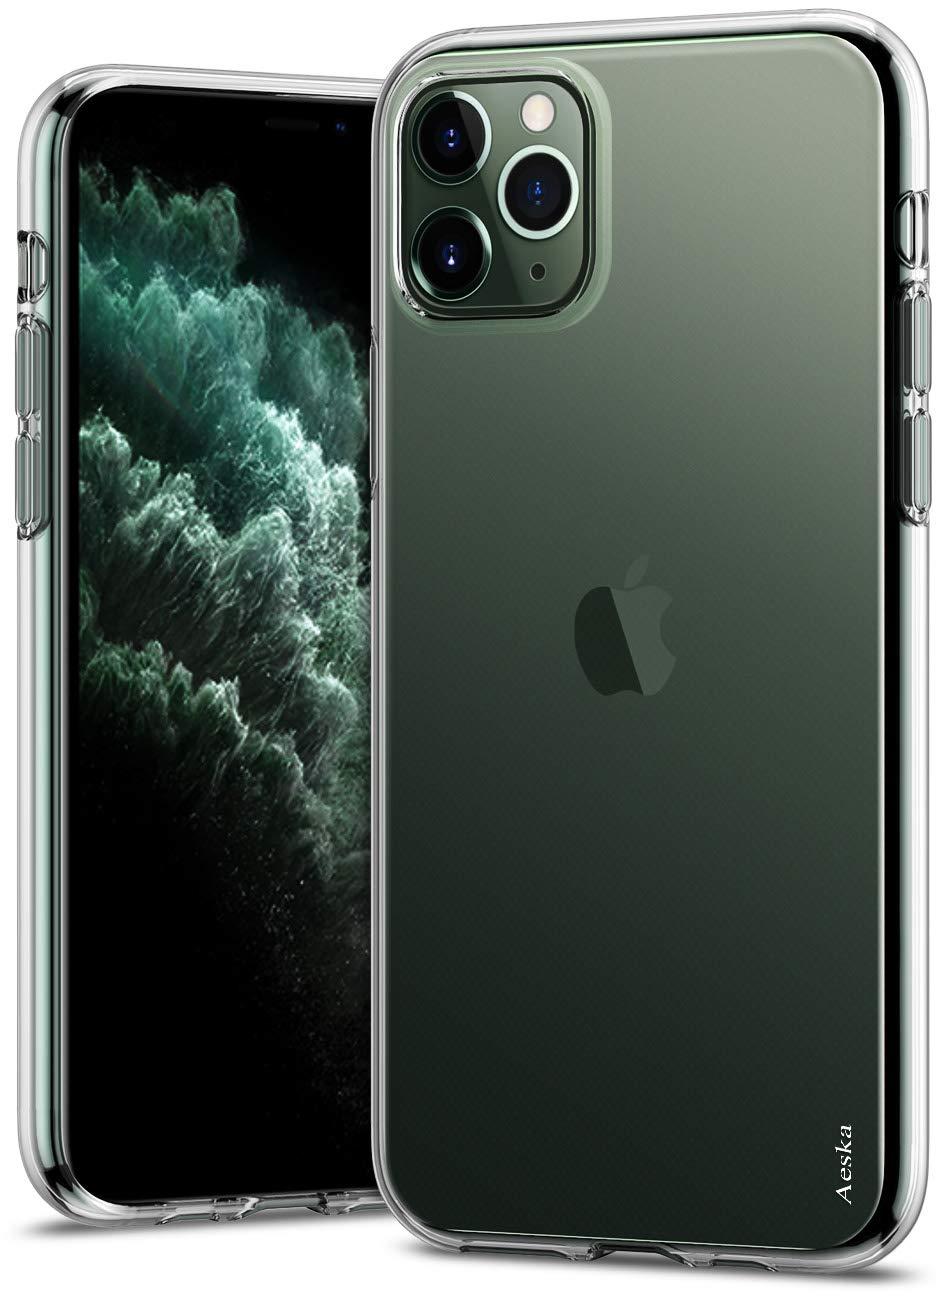 Aeska iPhone 11 Pro Max Case, Ultra [Slim Thin] Flexible Clear Soft TPU [Anti-Scratches] Anti-Slip TPU Gel Premium Rubber Skin Silicone Protective Case Cover for iPhone 11 Pro Max 6.5'' (Clear)